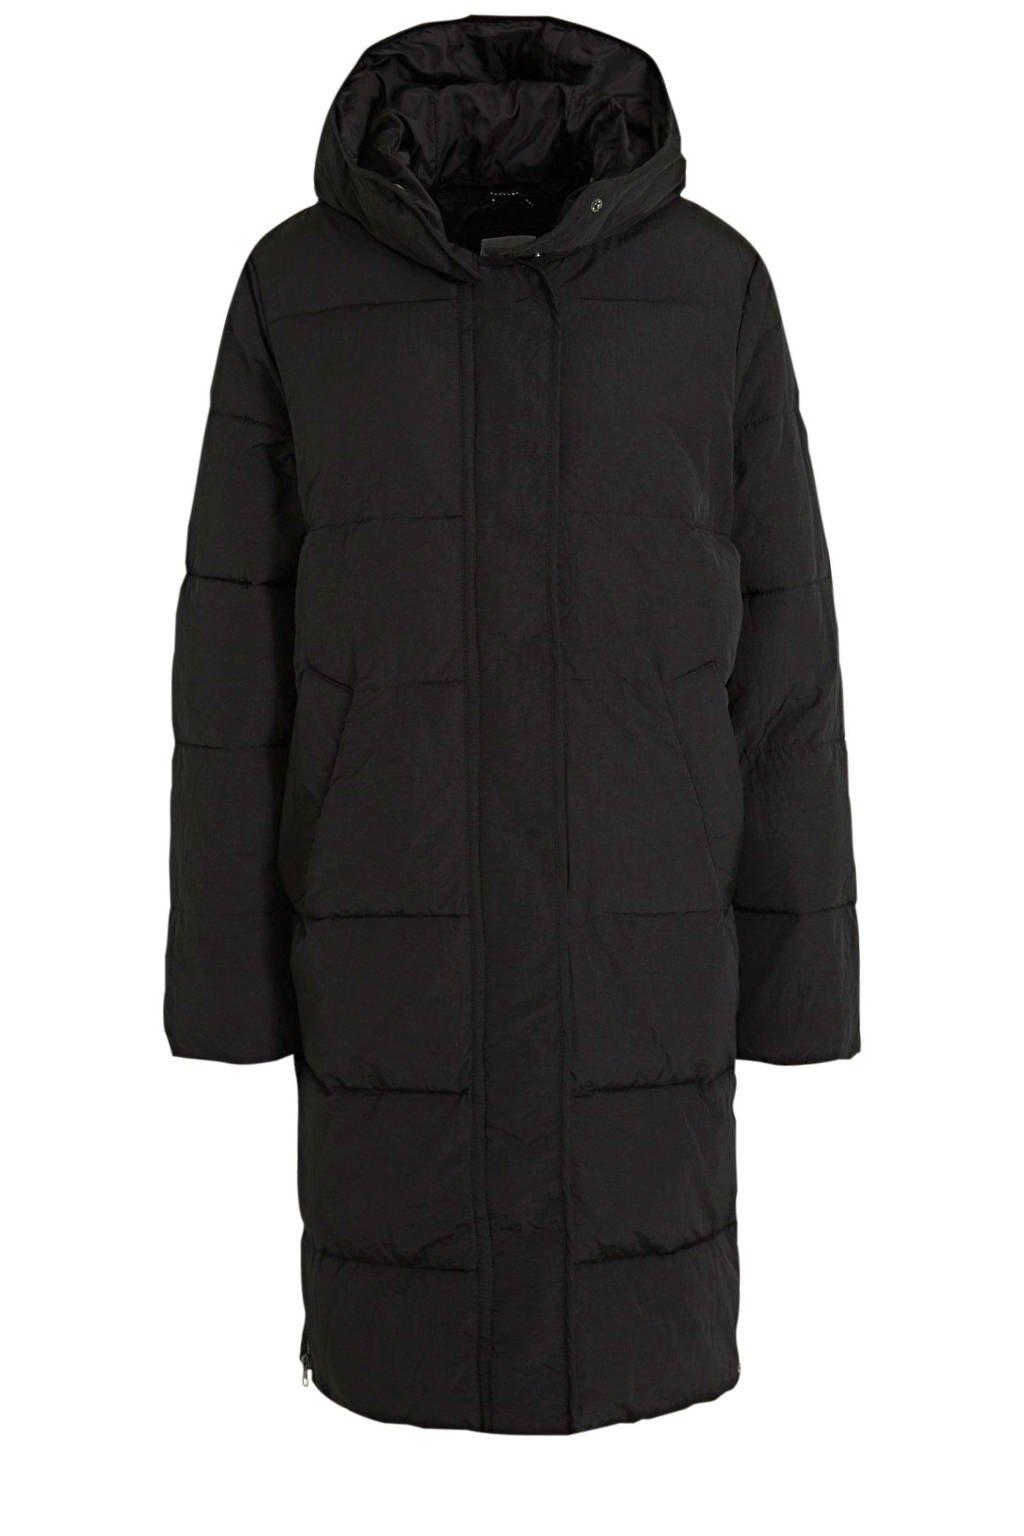 Fransa gewatteerde jas Lot zwart, Zwart